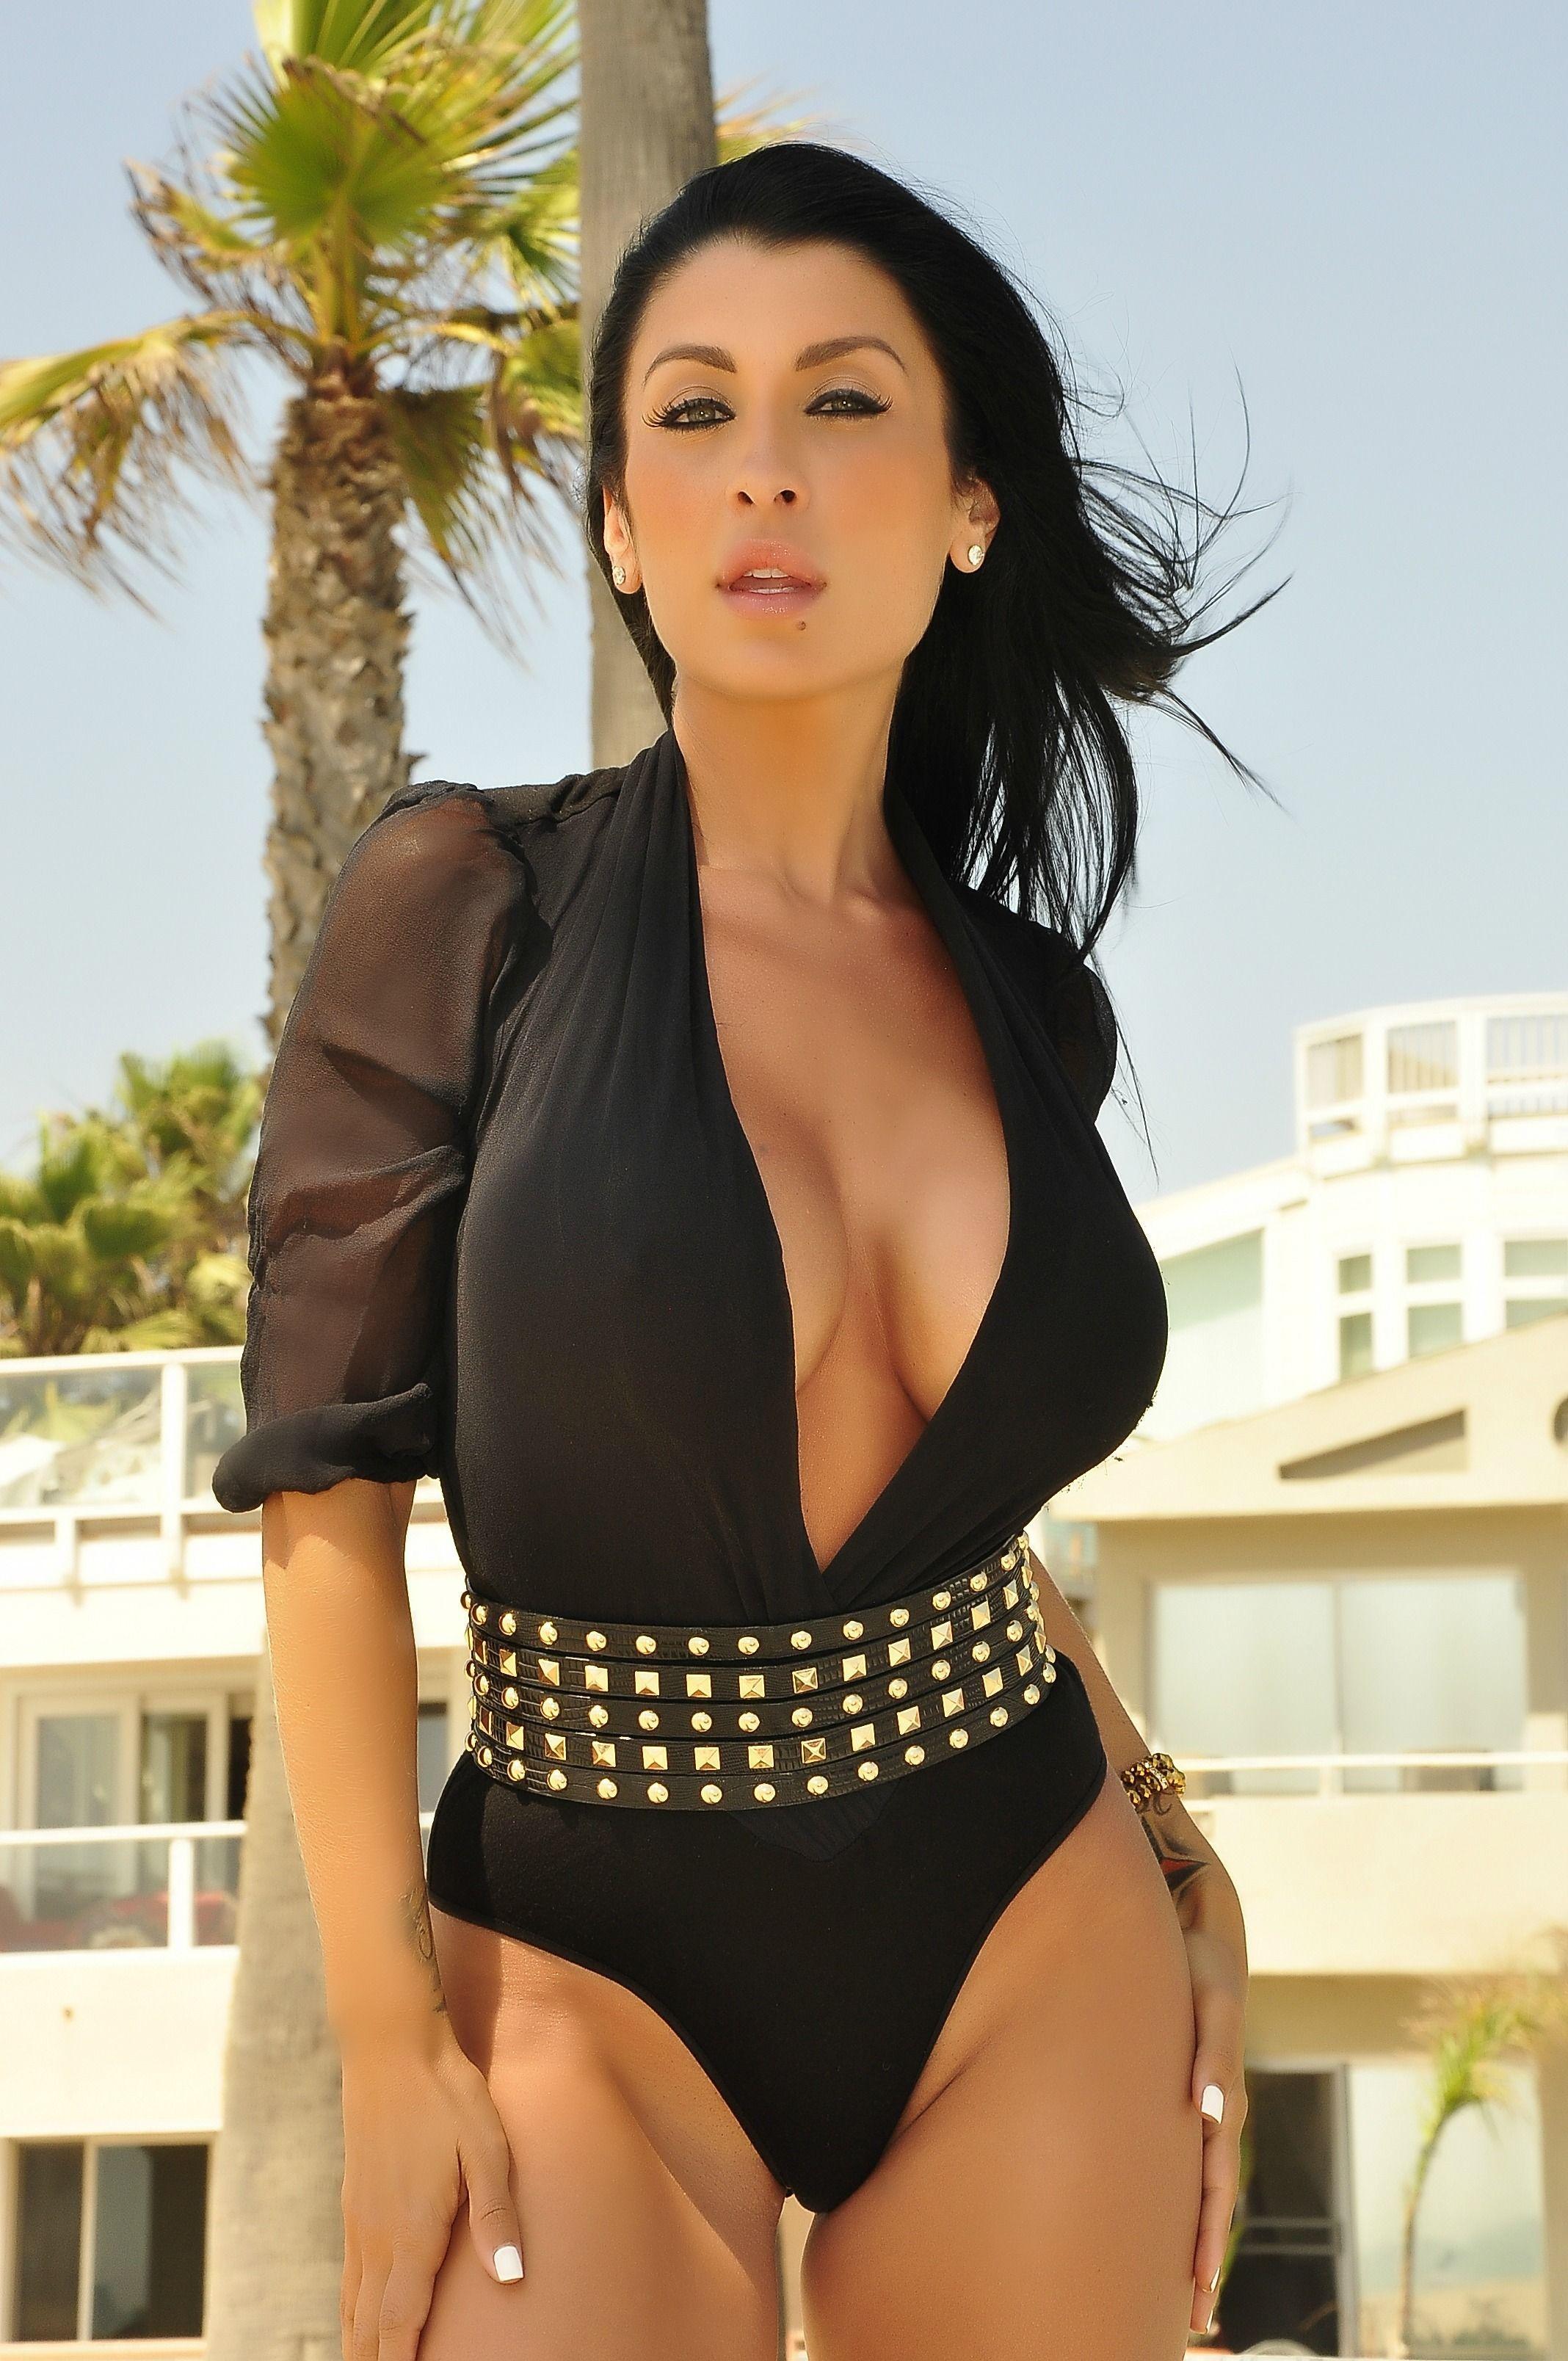 cb861c0c95 Jessica Canizales Playboy Playmates